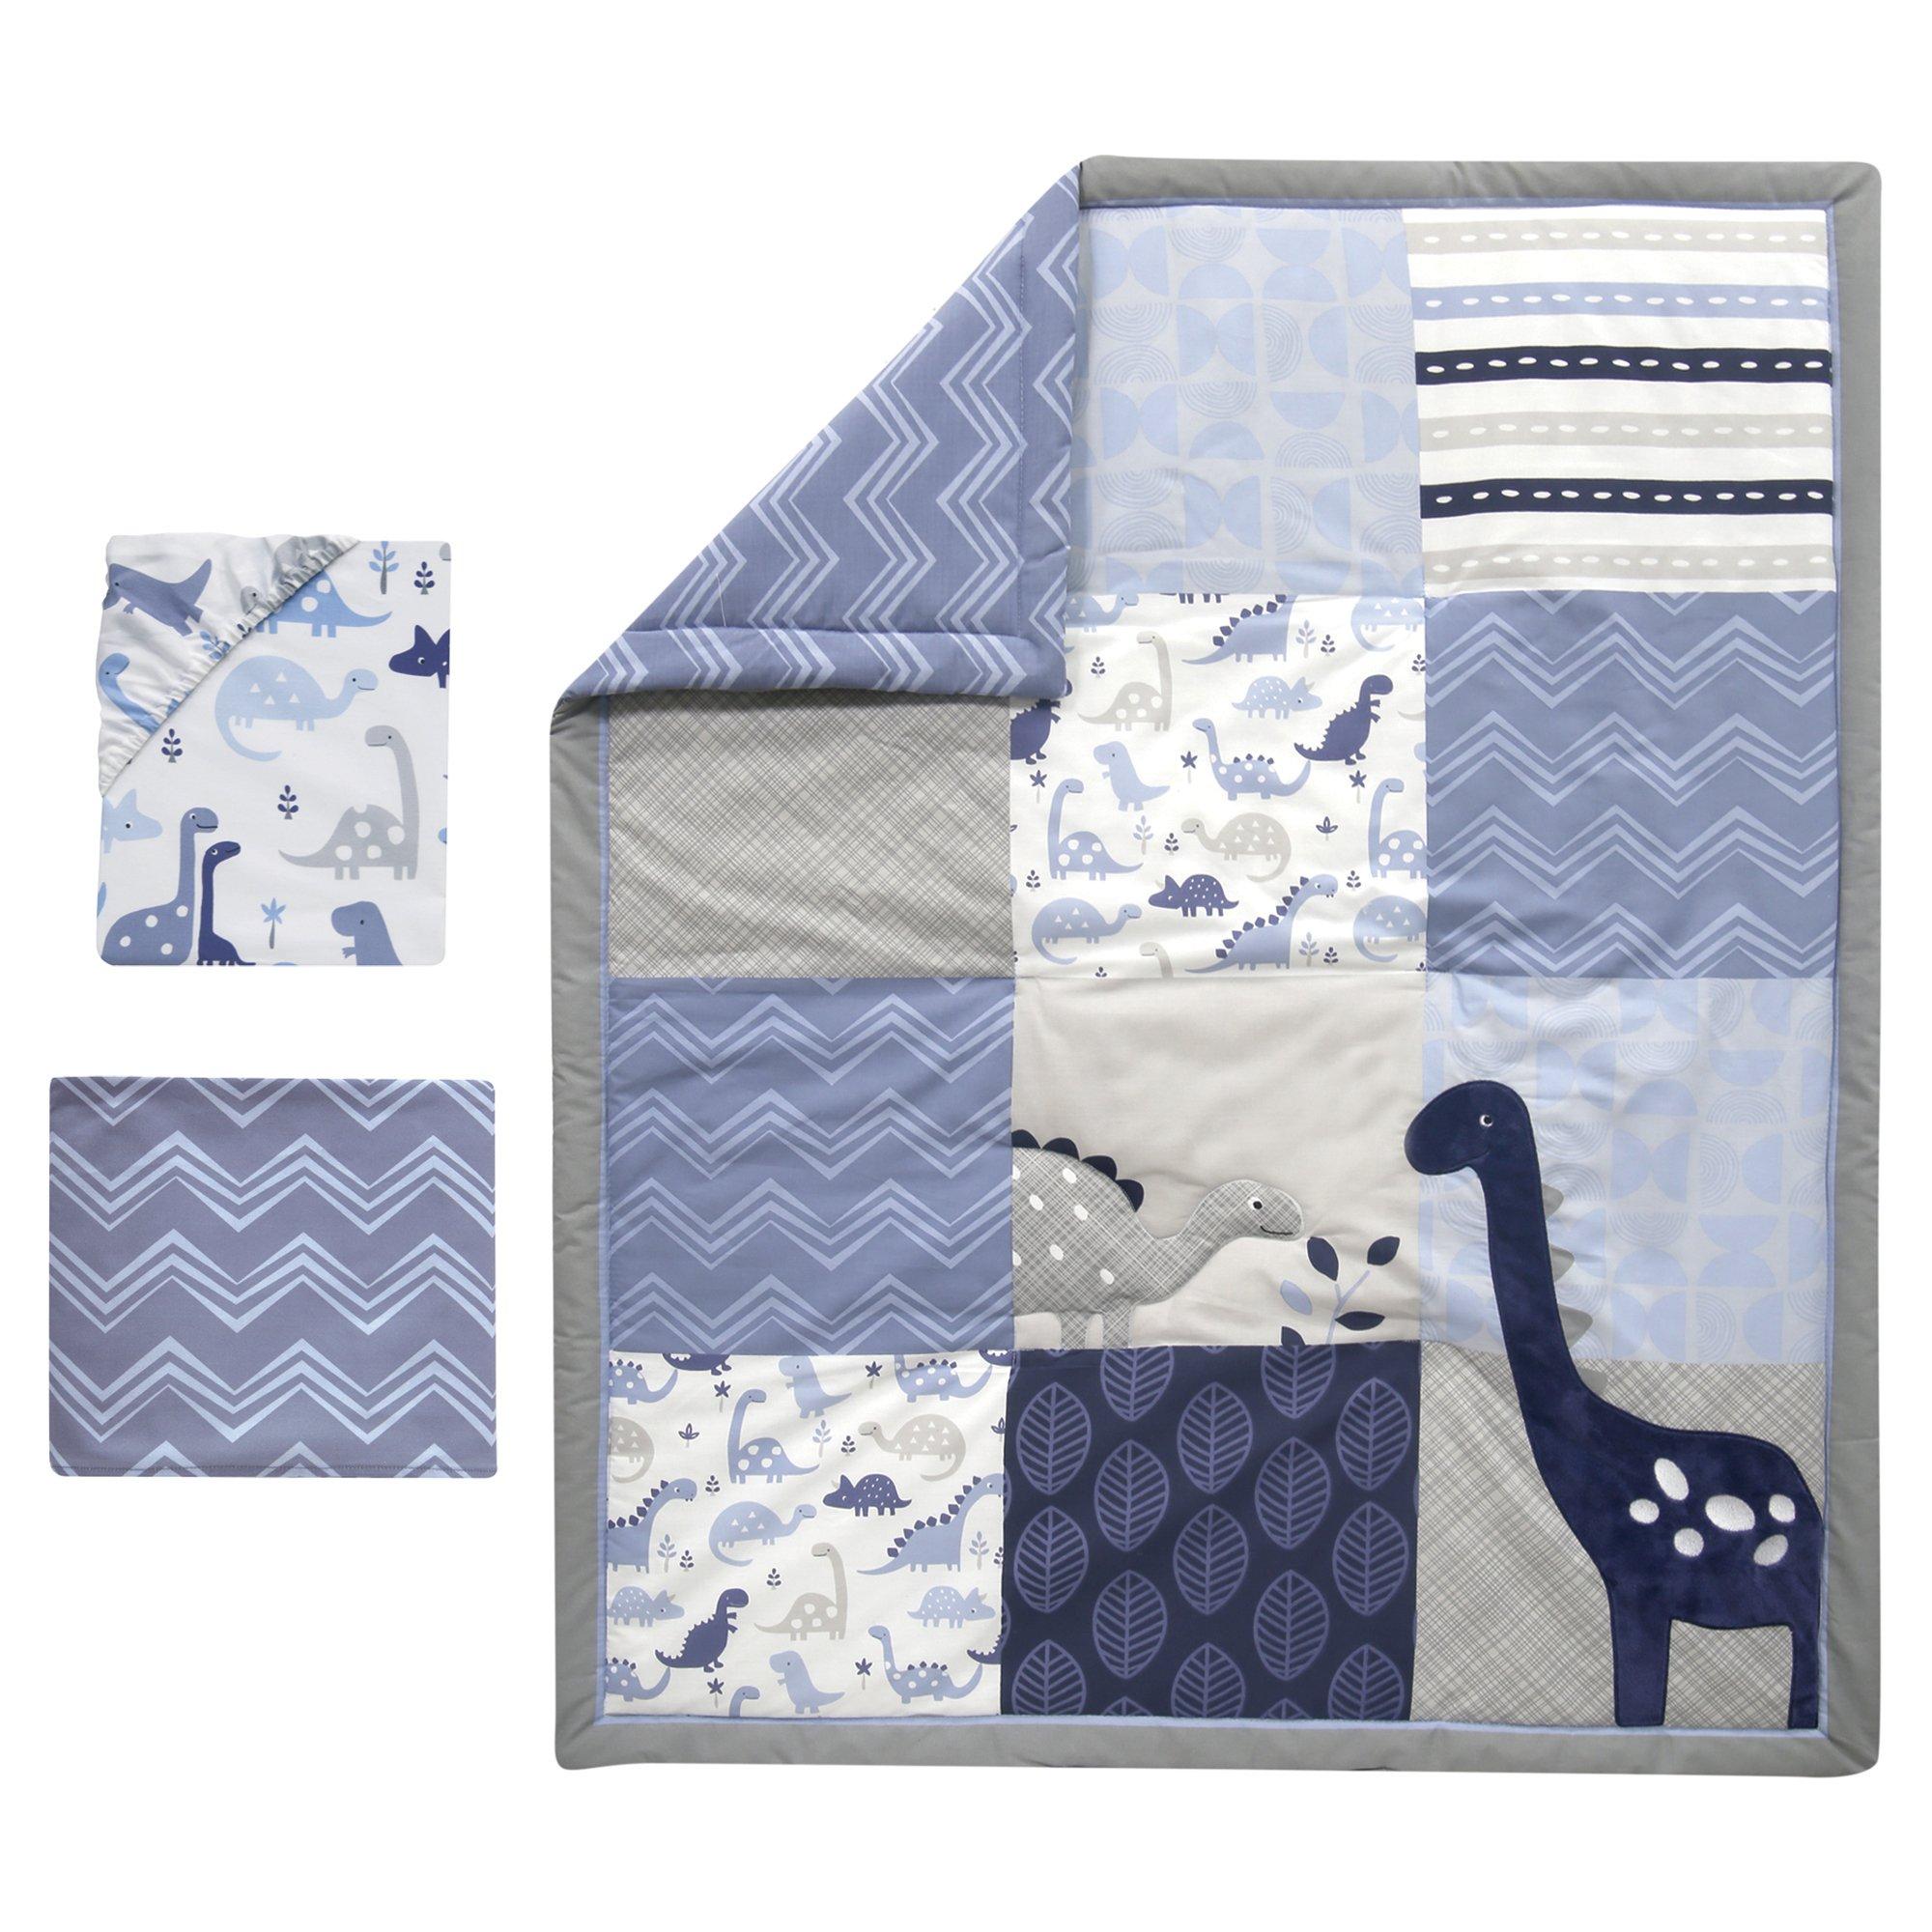 Bedtime Originals Roar Dinosaur 3 Piece Crib Bedding Set Blue Gray